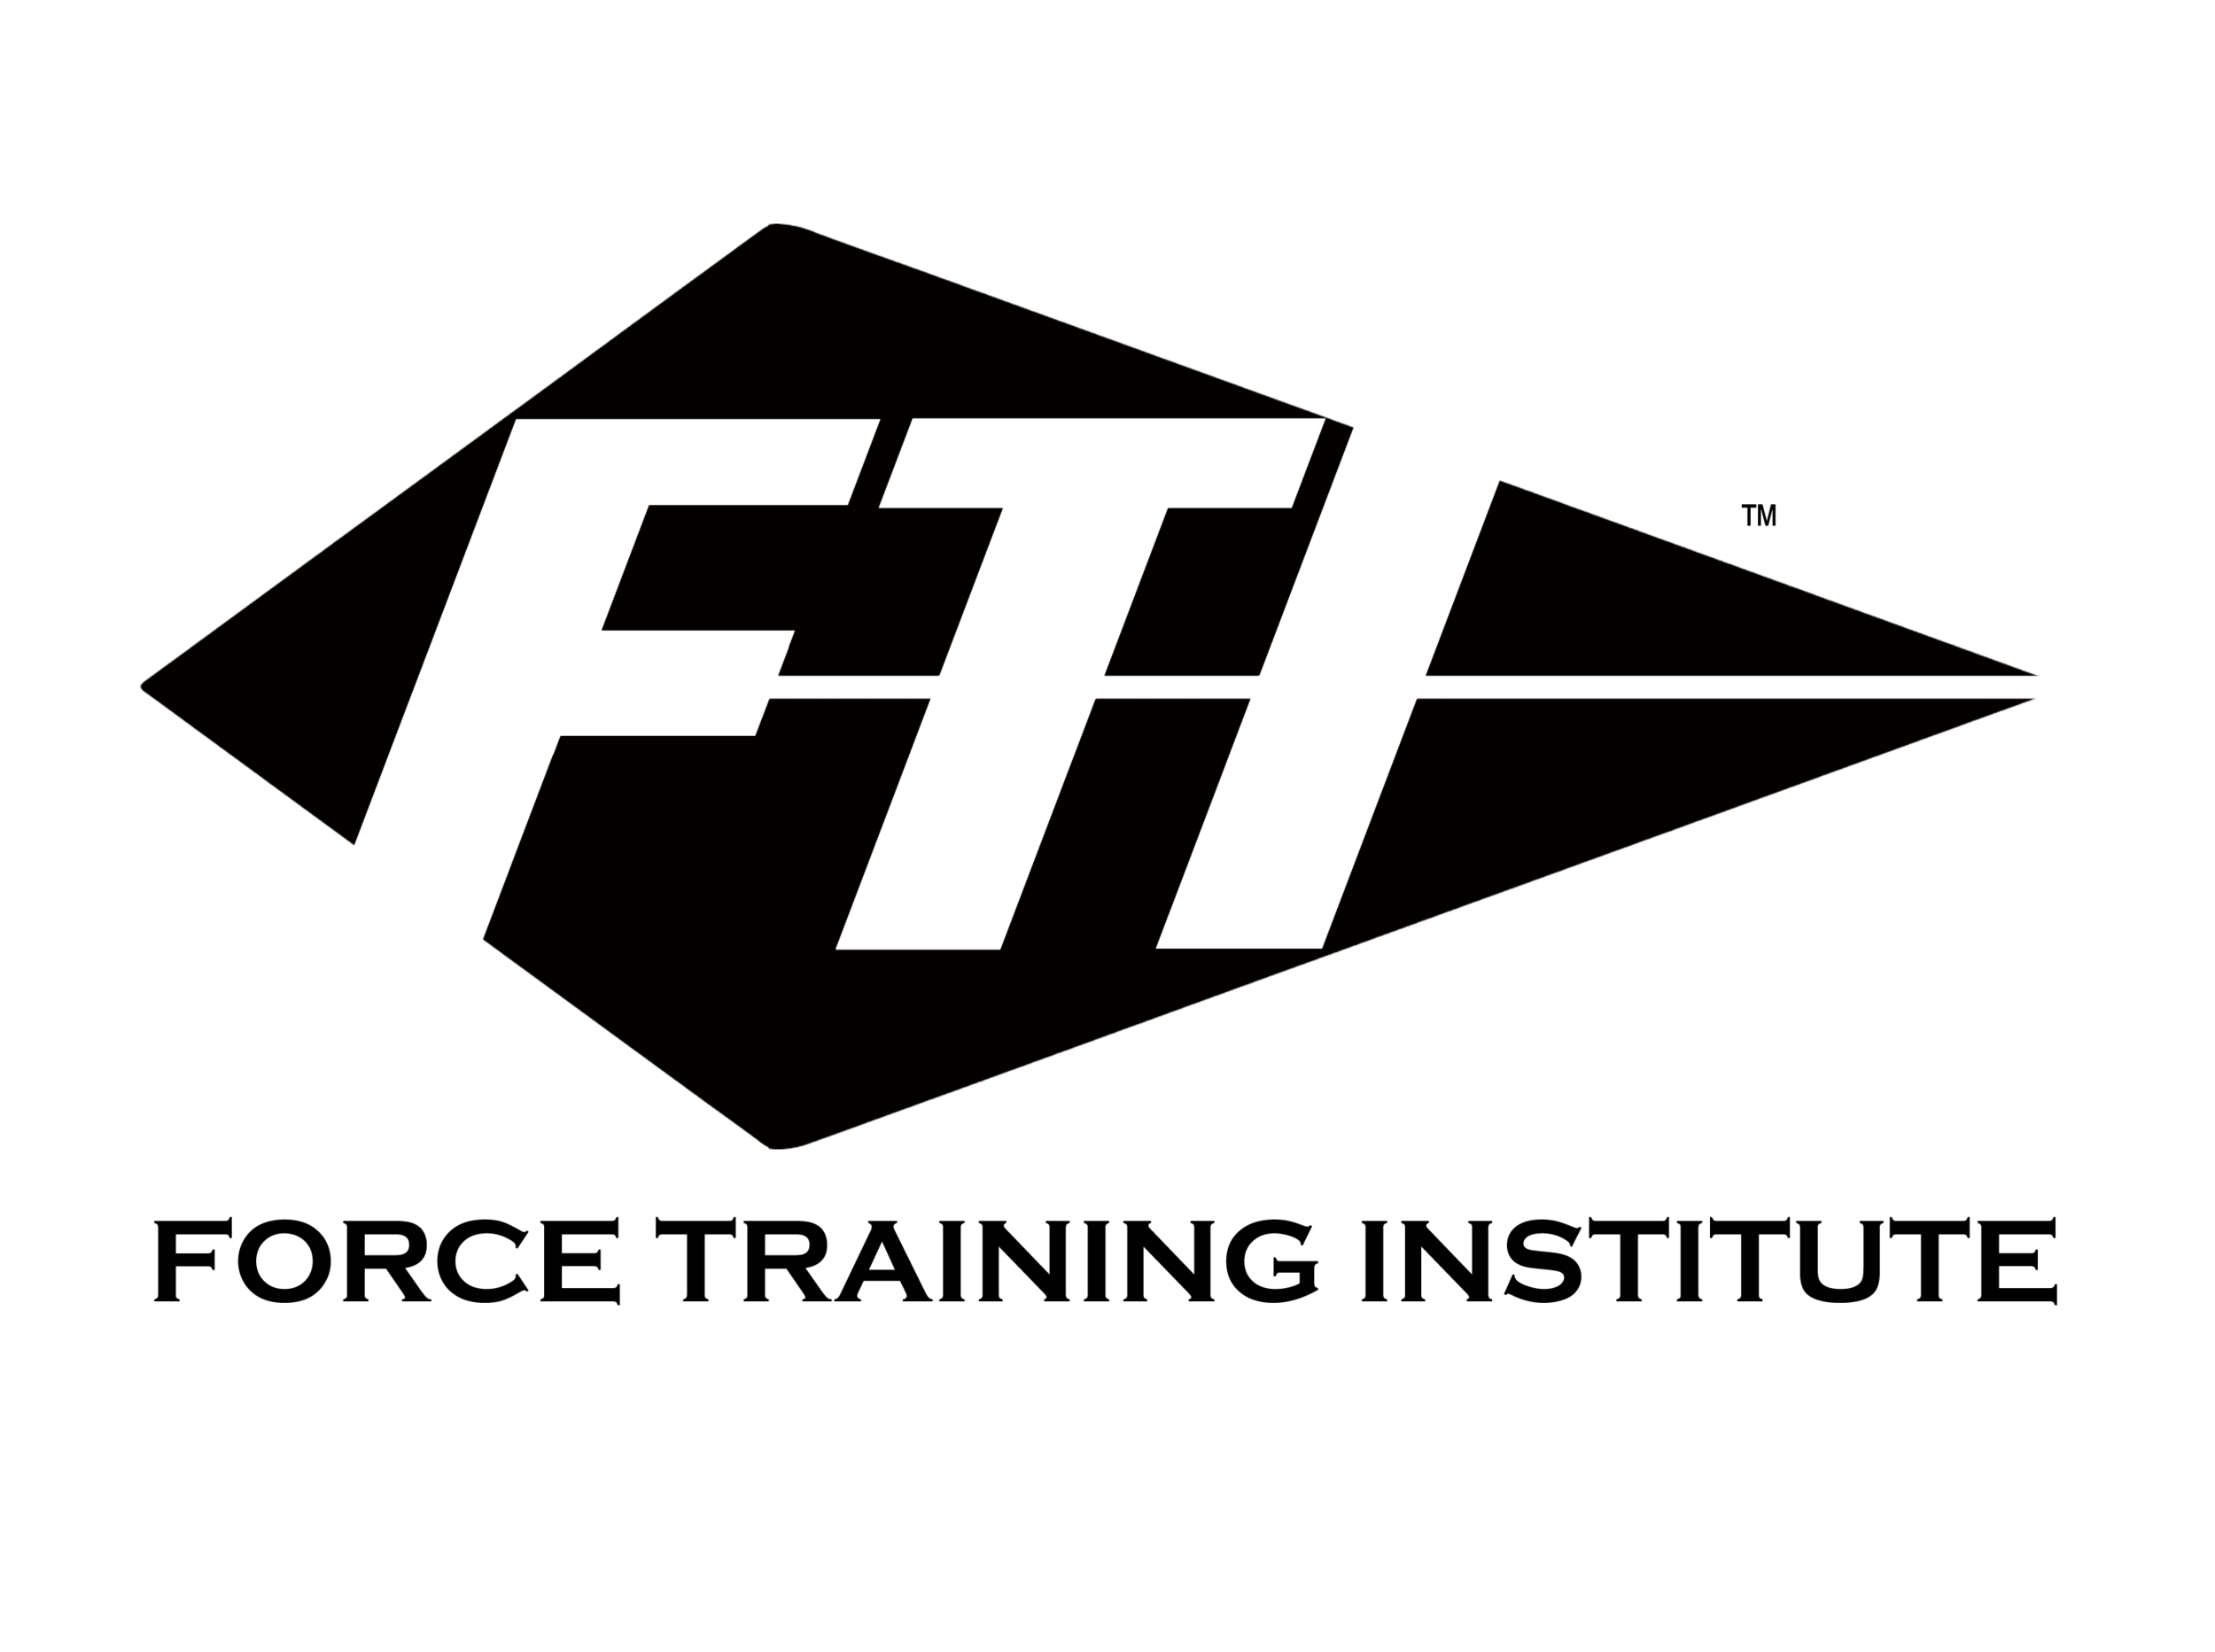 FTI_black_transparent_bg.png